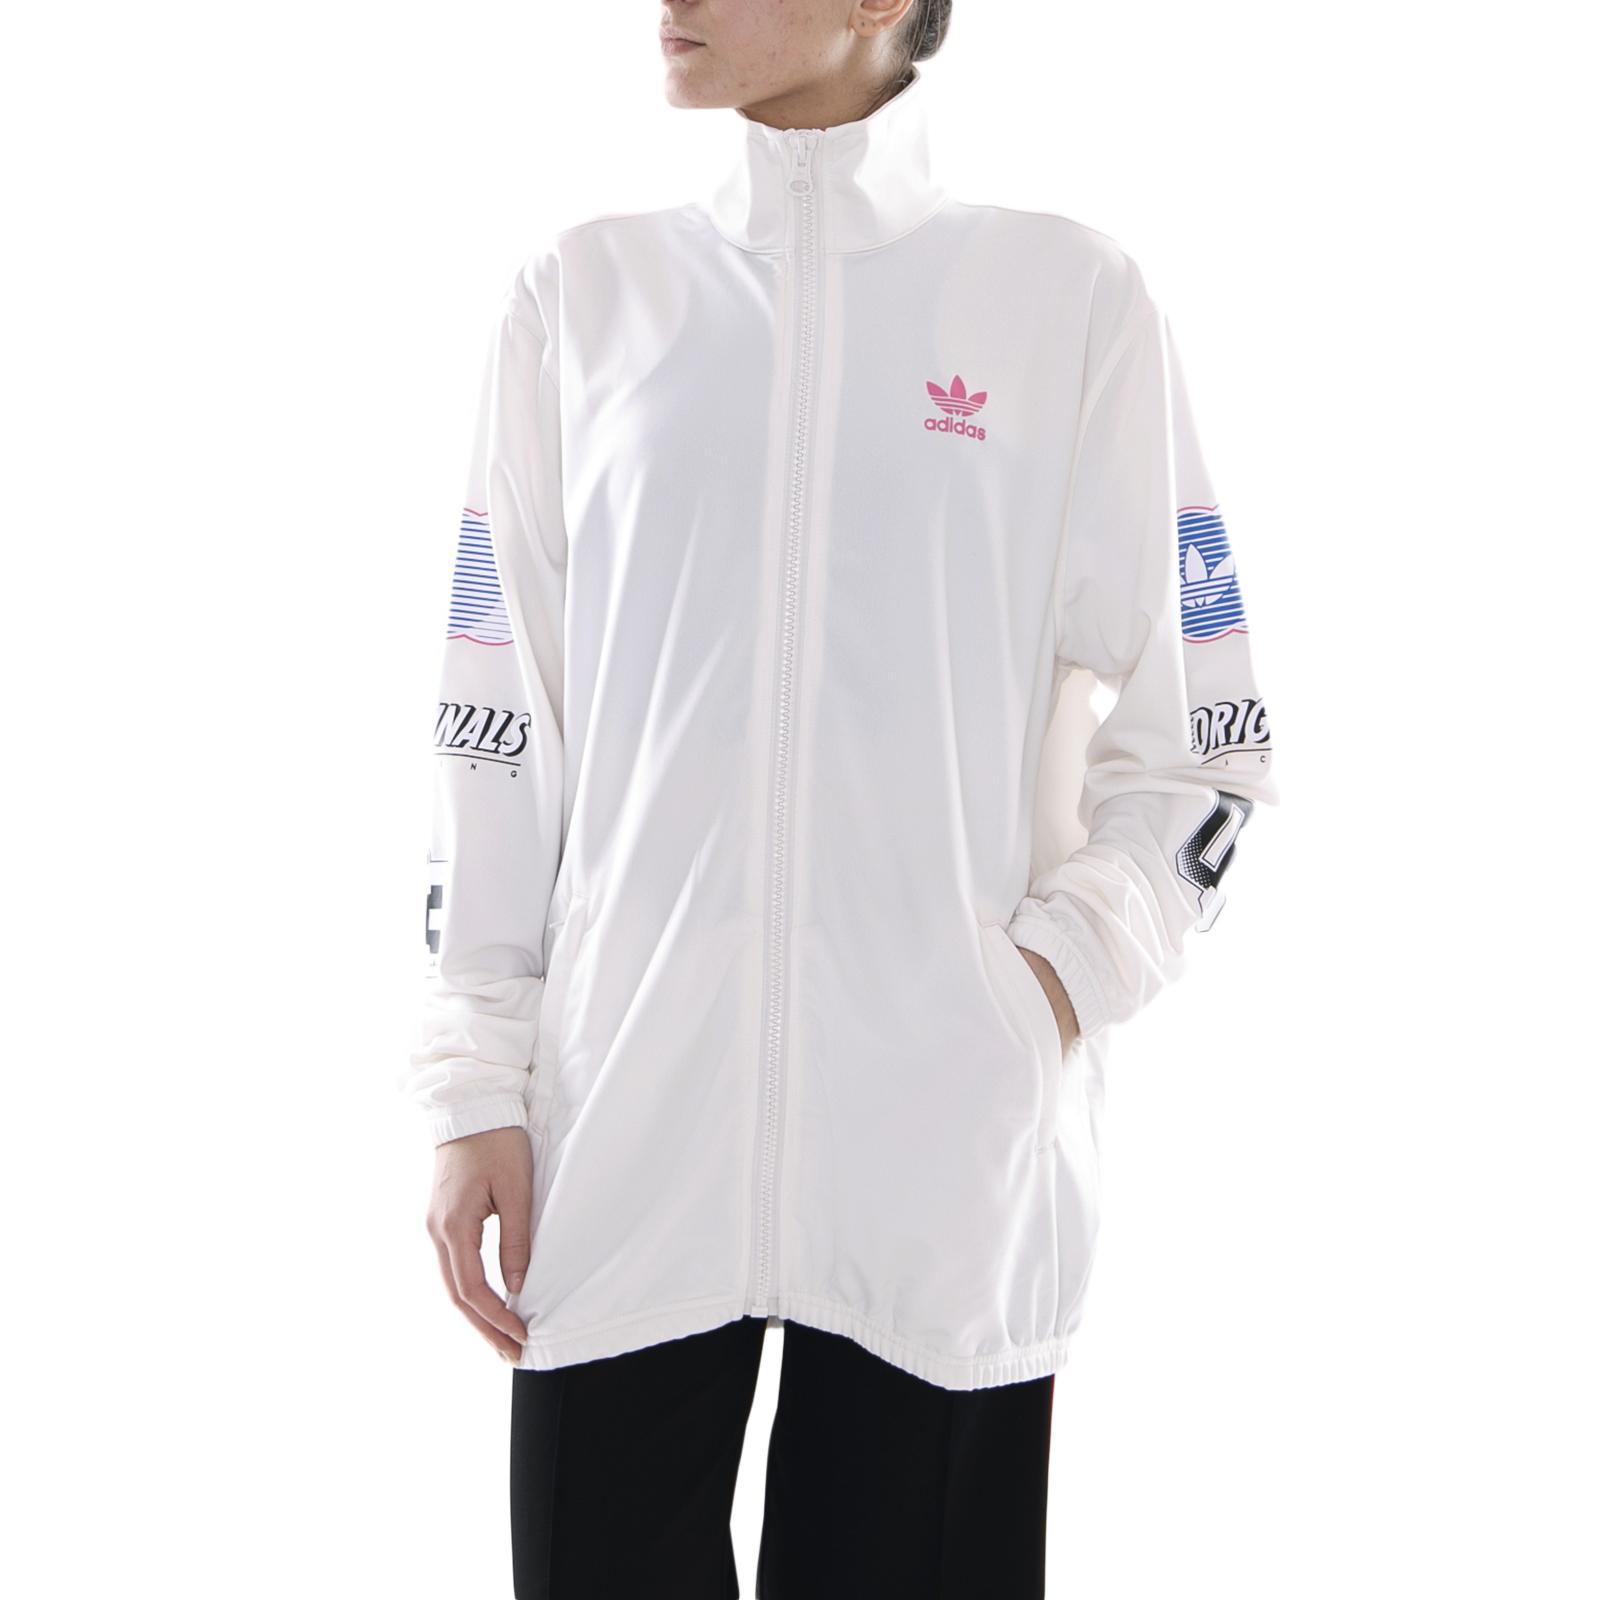 1b1cd75357c0 Adidas giacche track jacket chalk white bianco